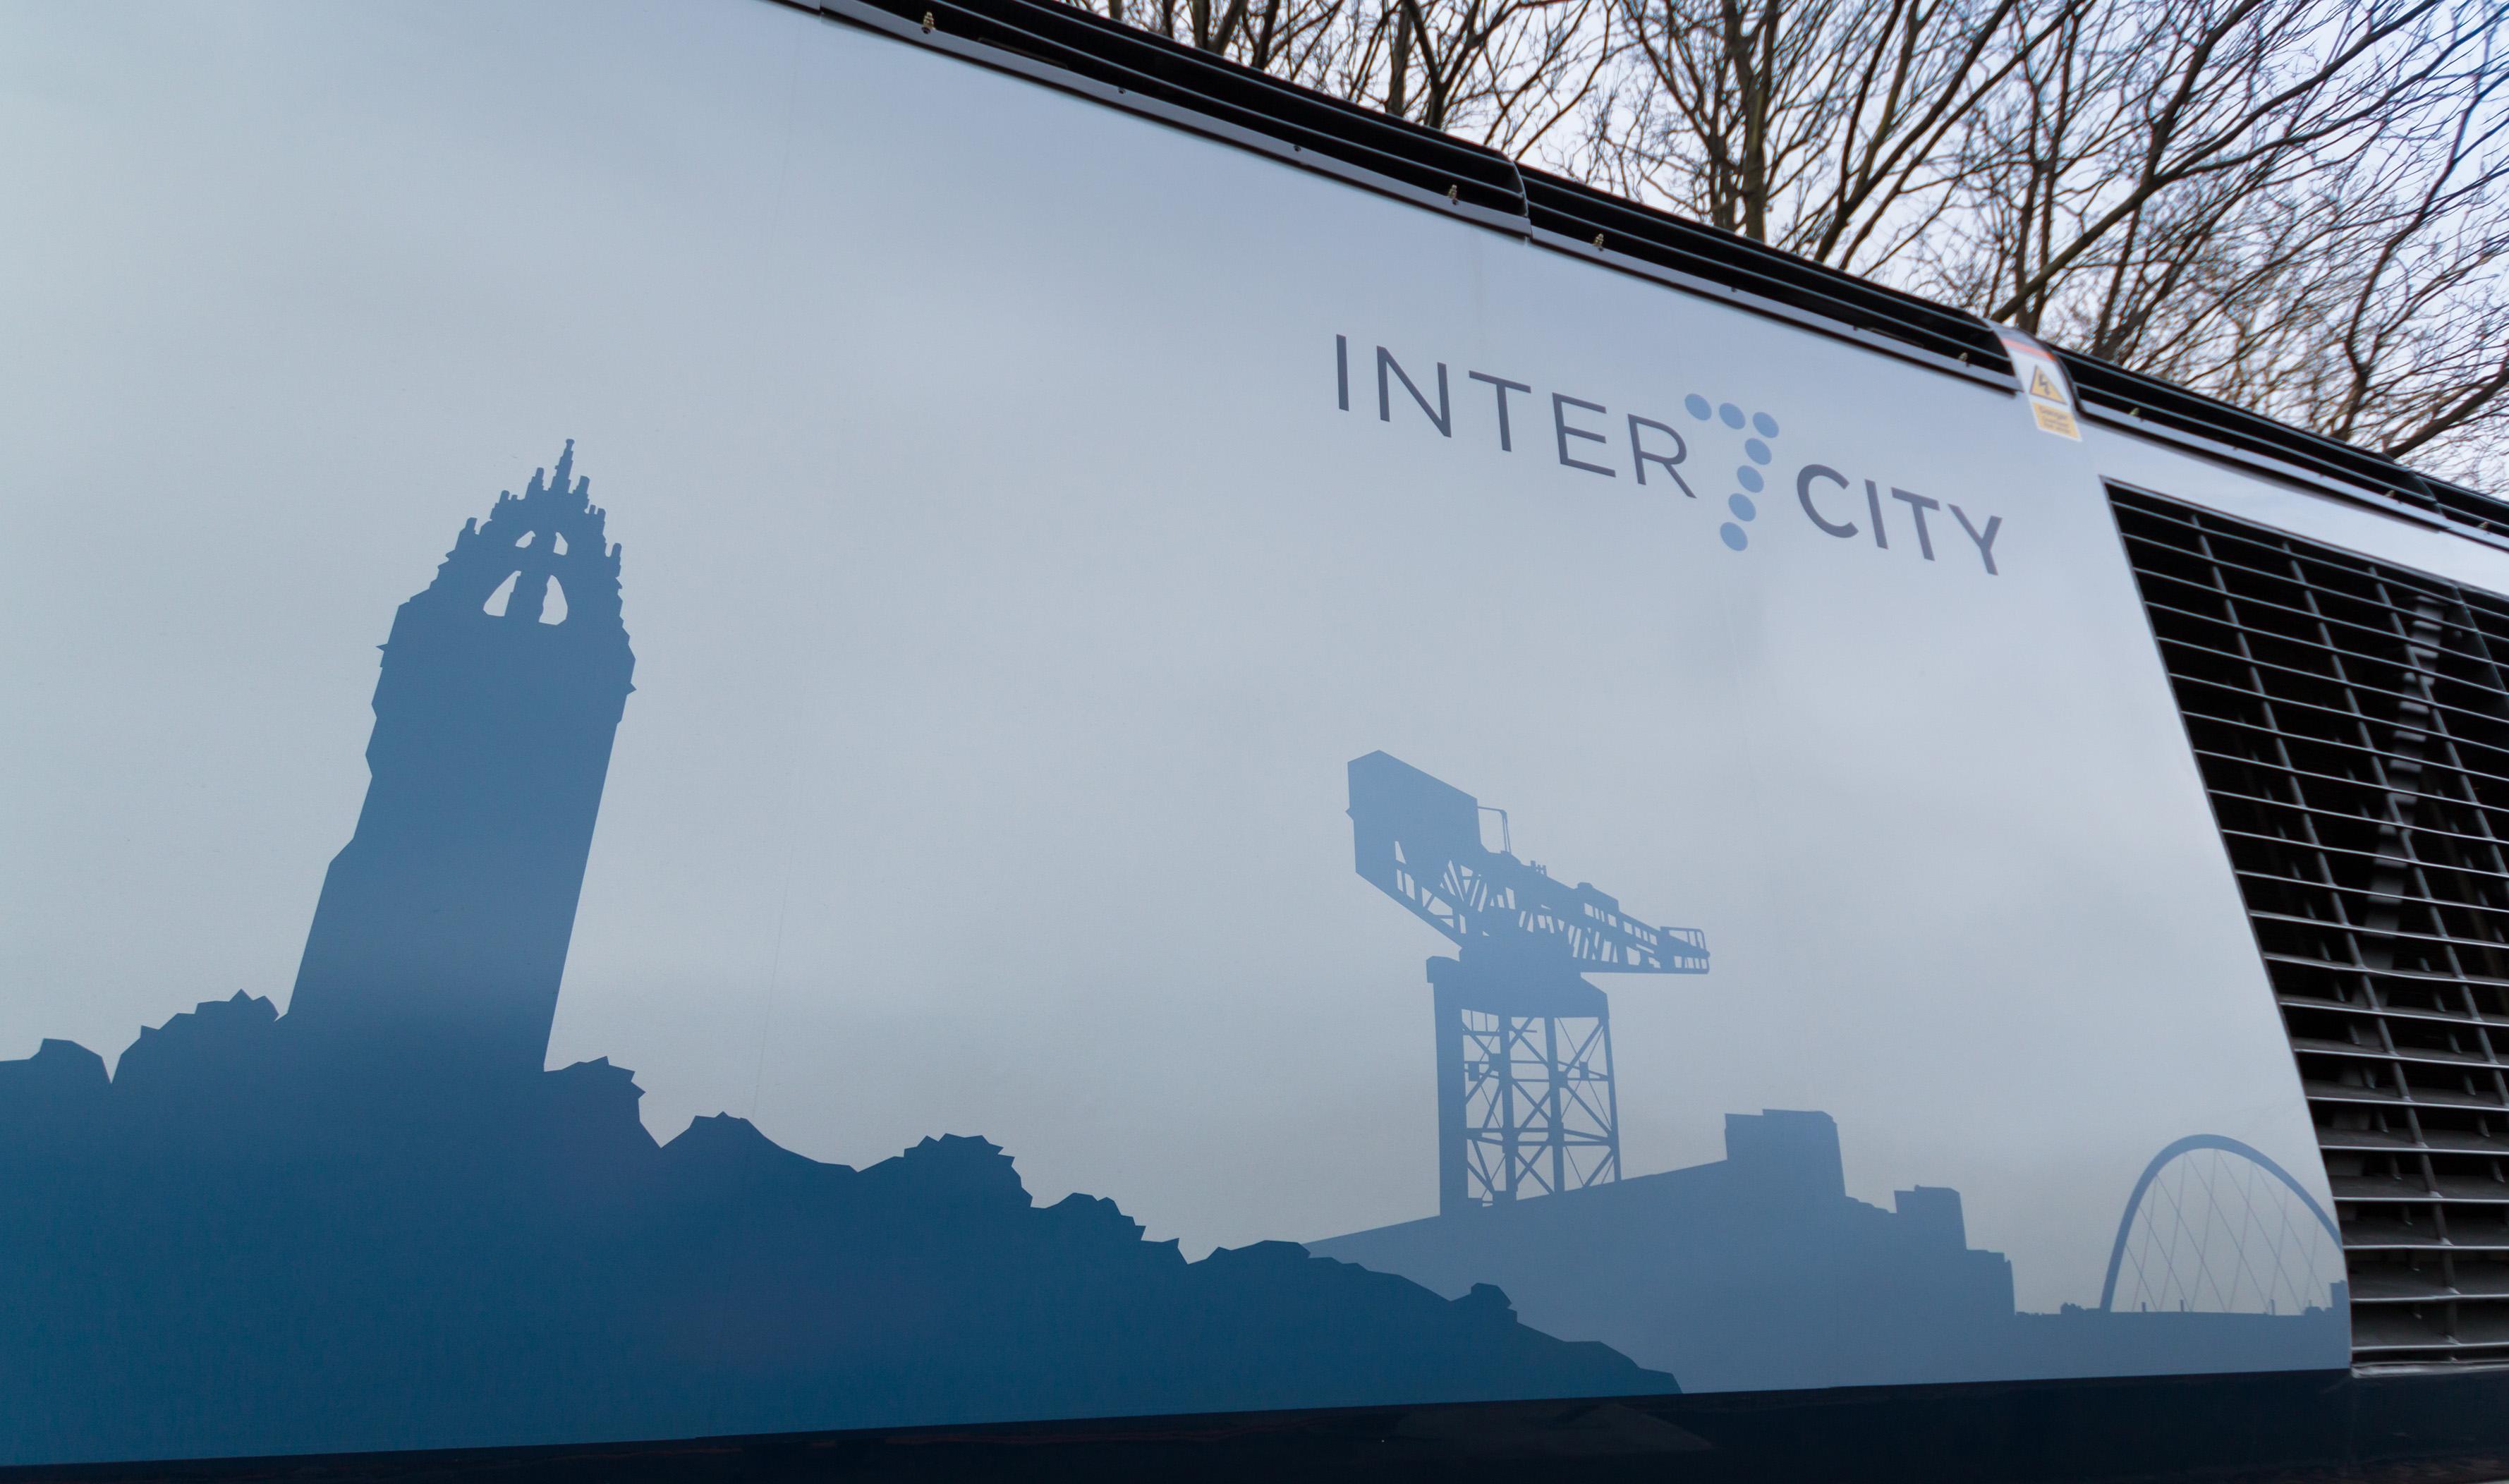 InterCity 1